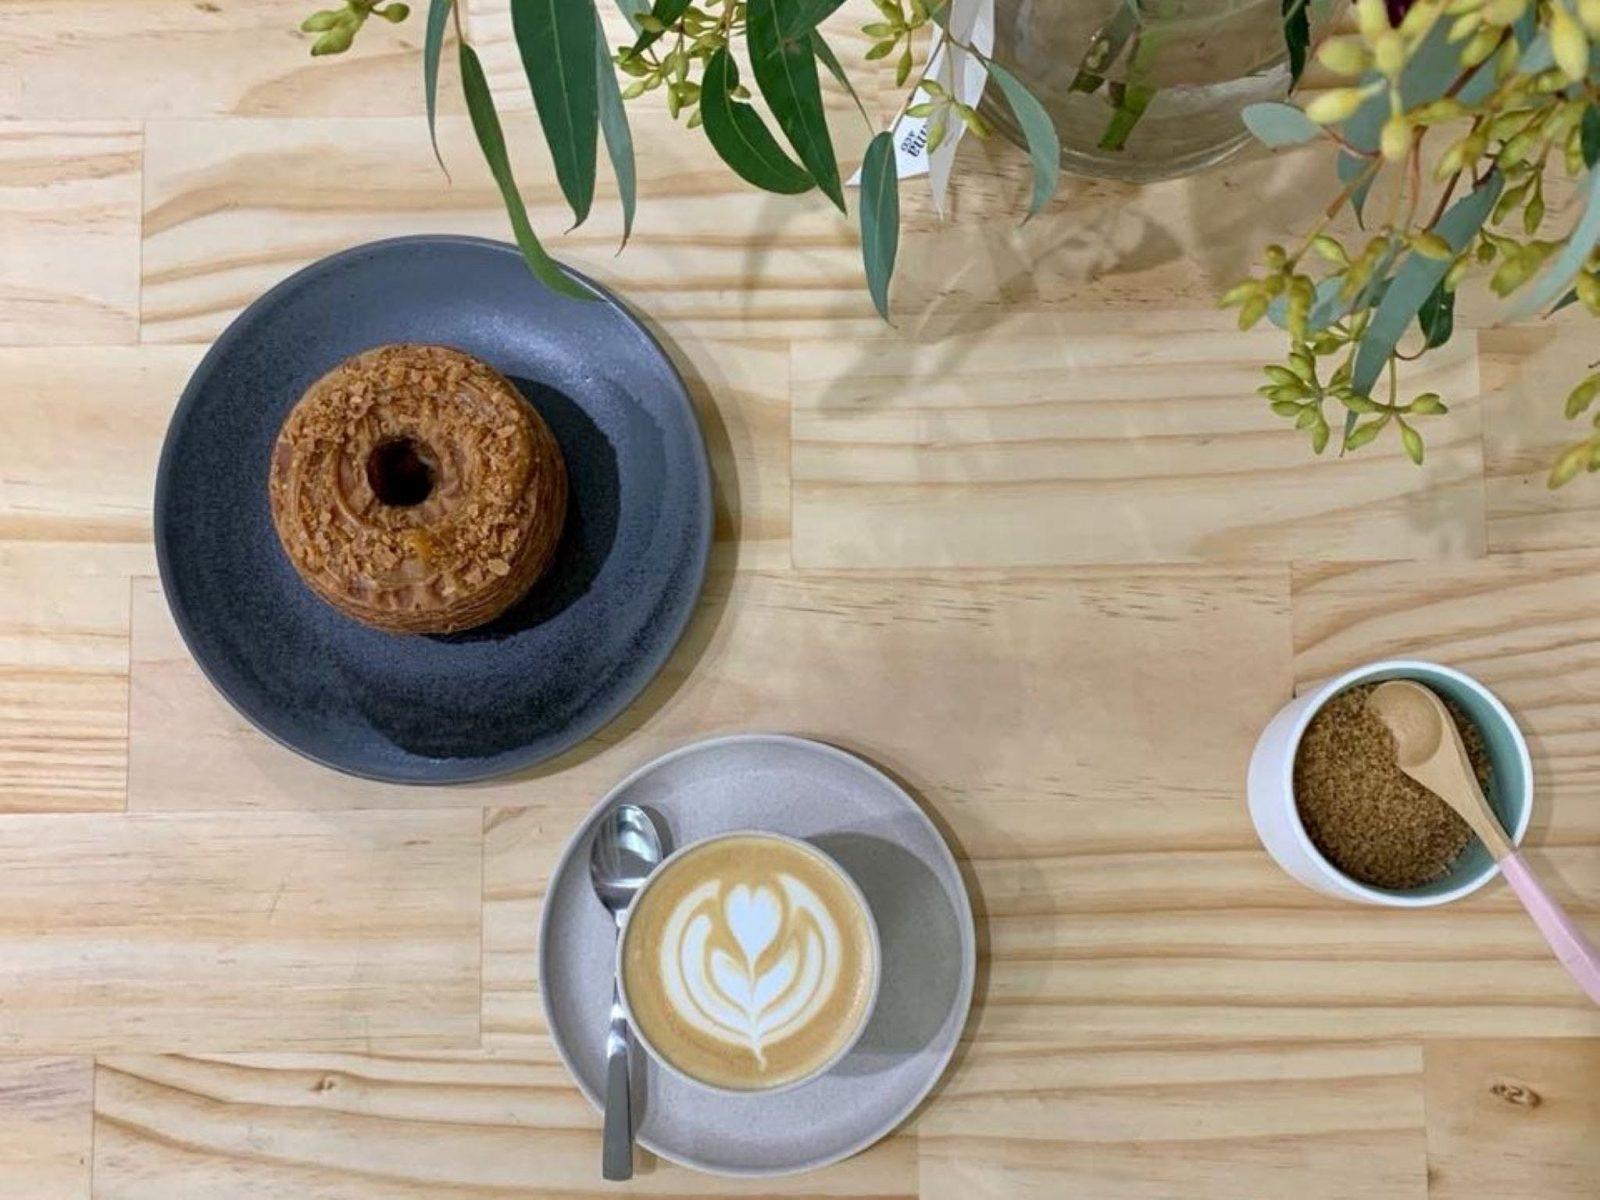 Bricks and Mortar Coffee Co